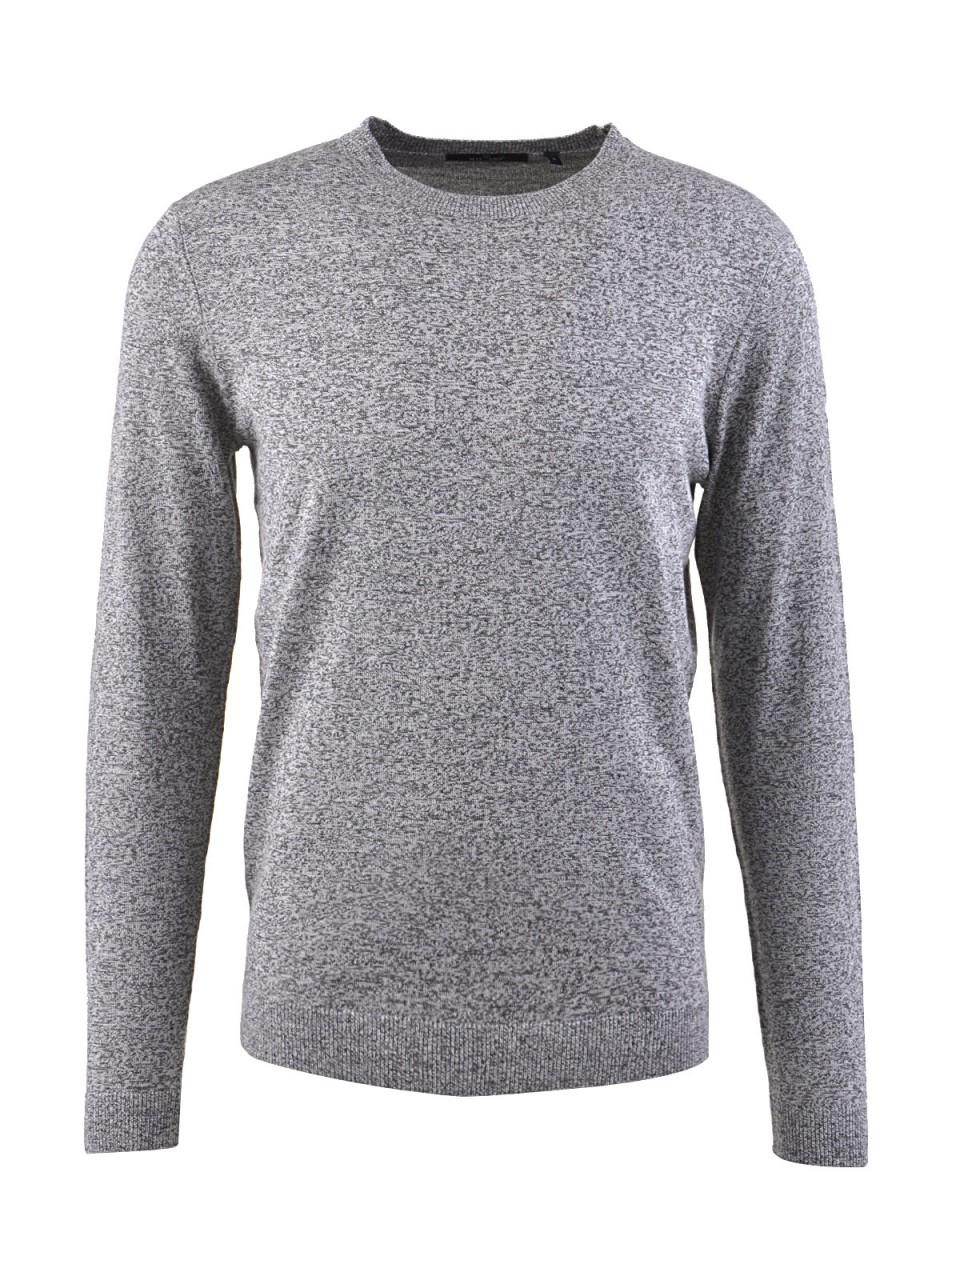 milano-italy-herren-pullover-grau